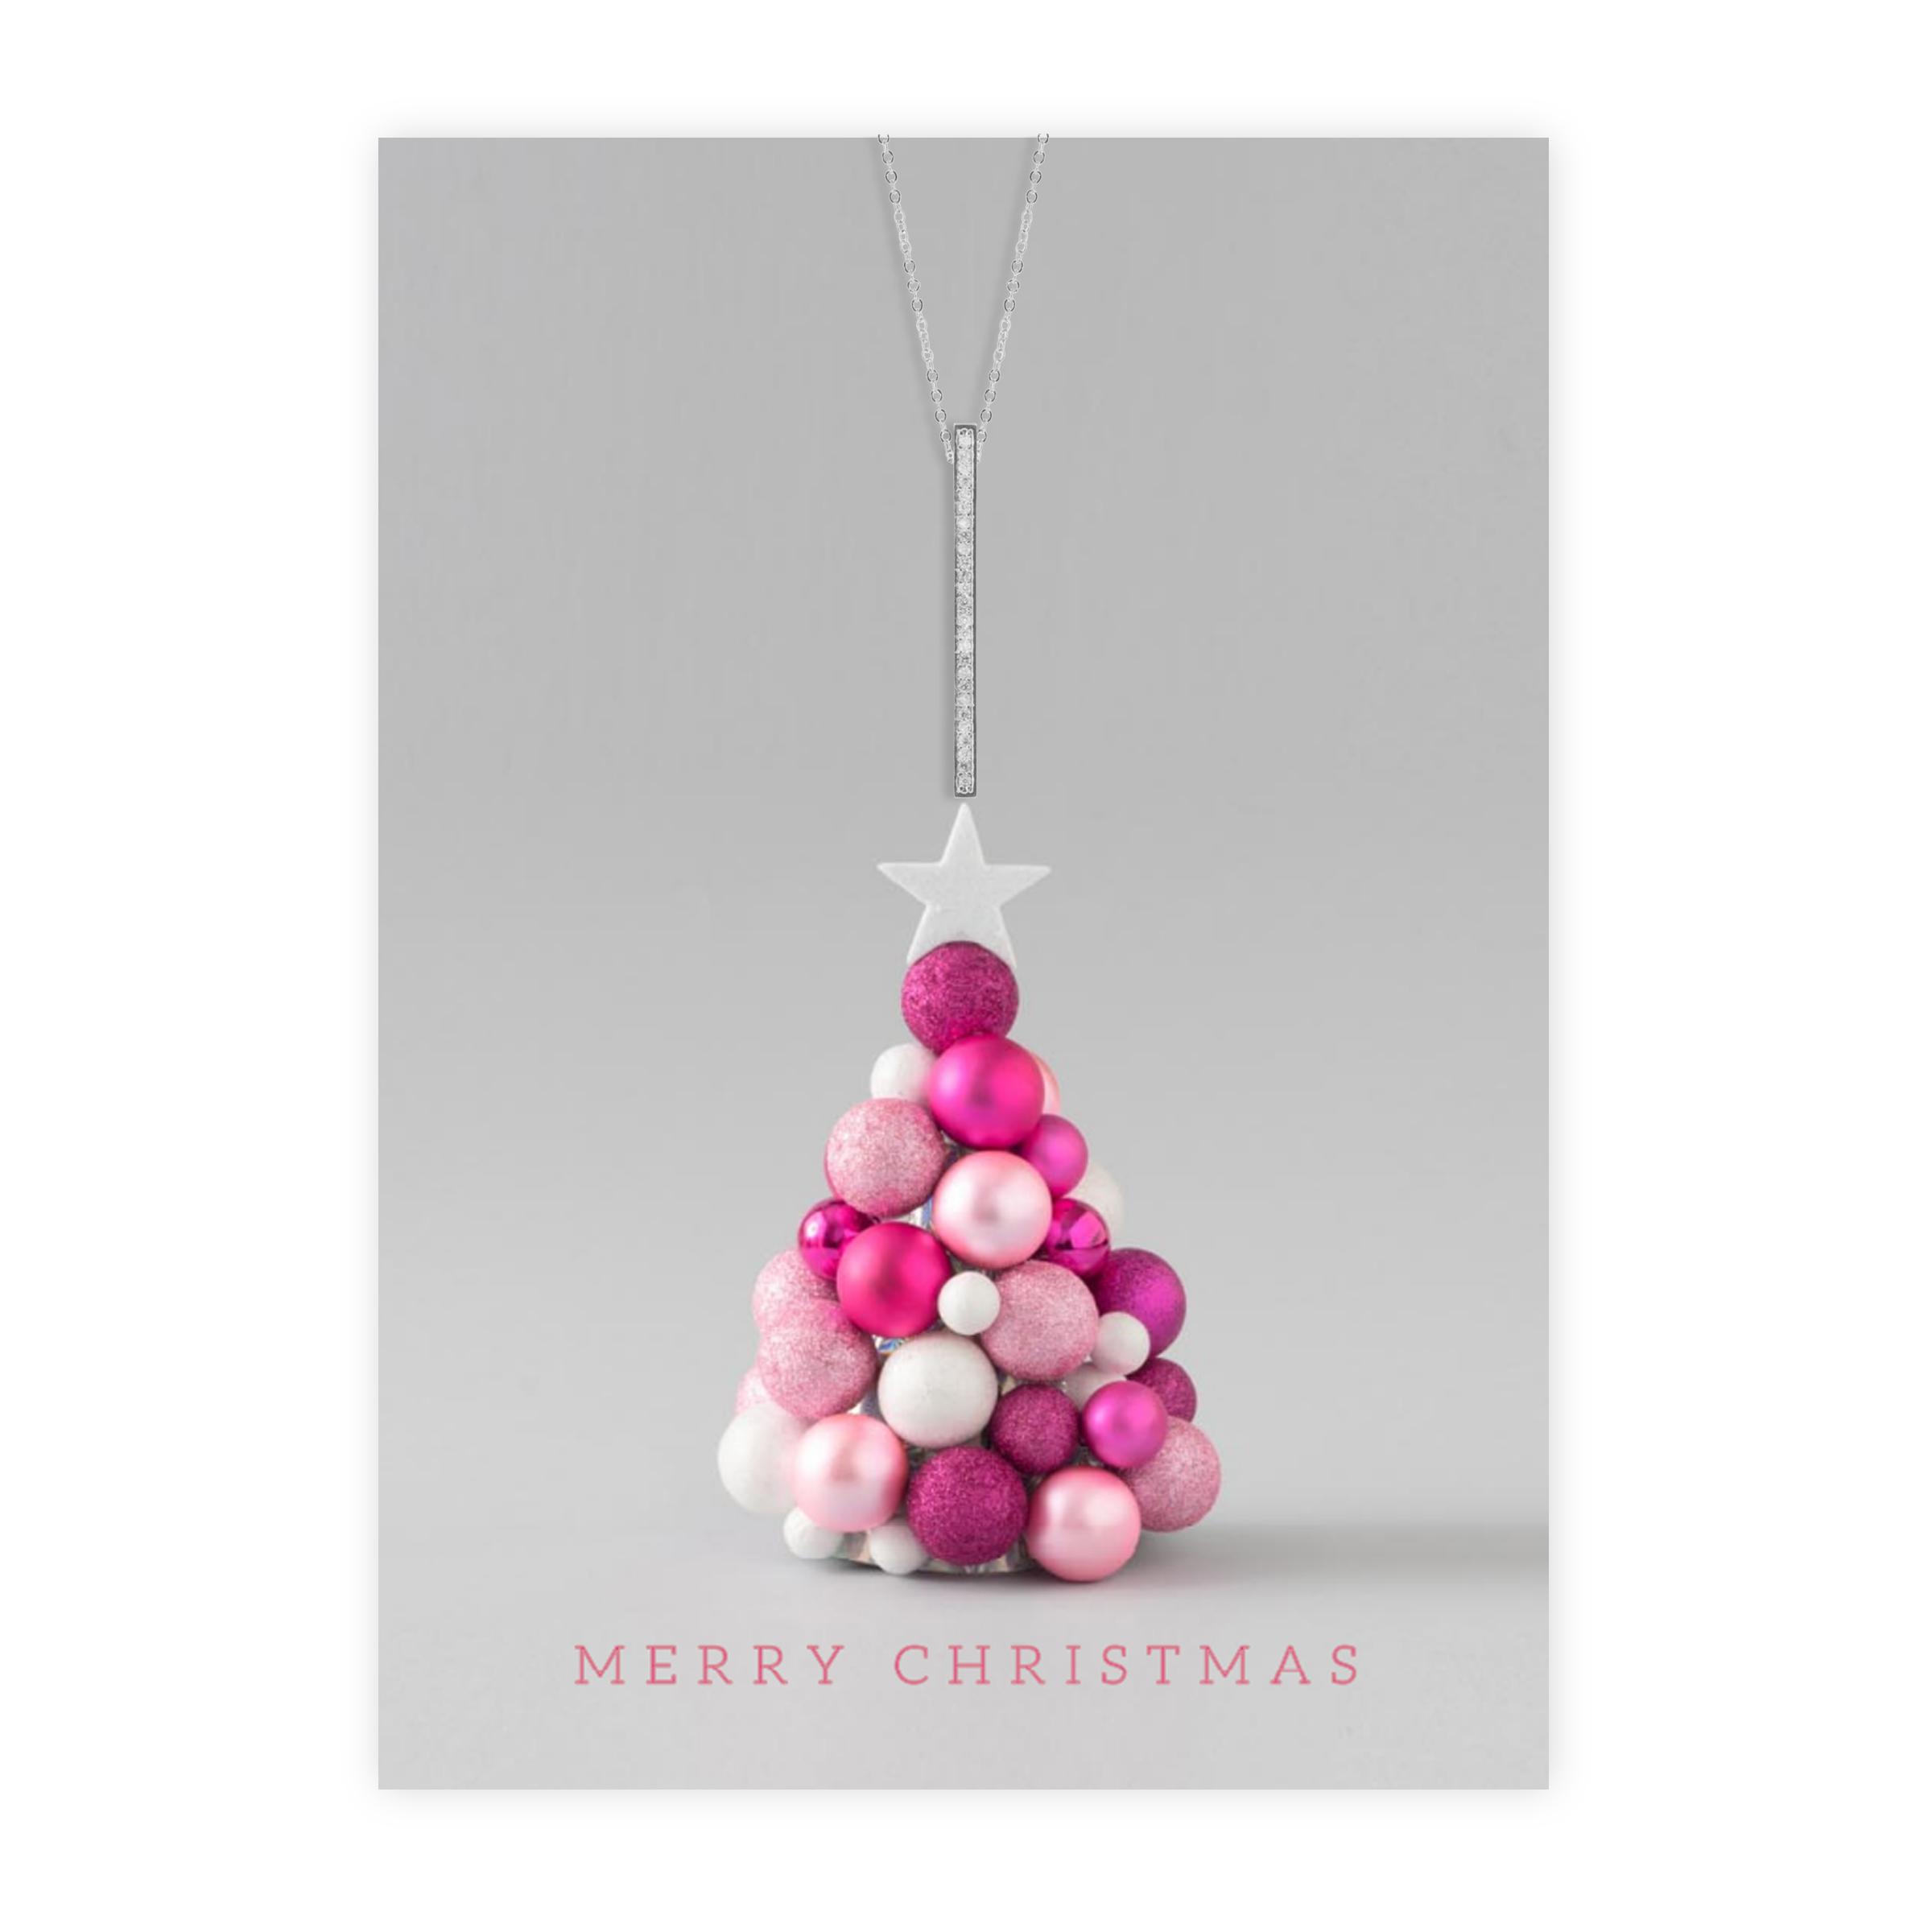 Christmas Card With Silver Bar Pendant